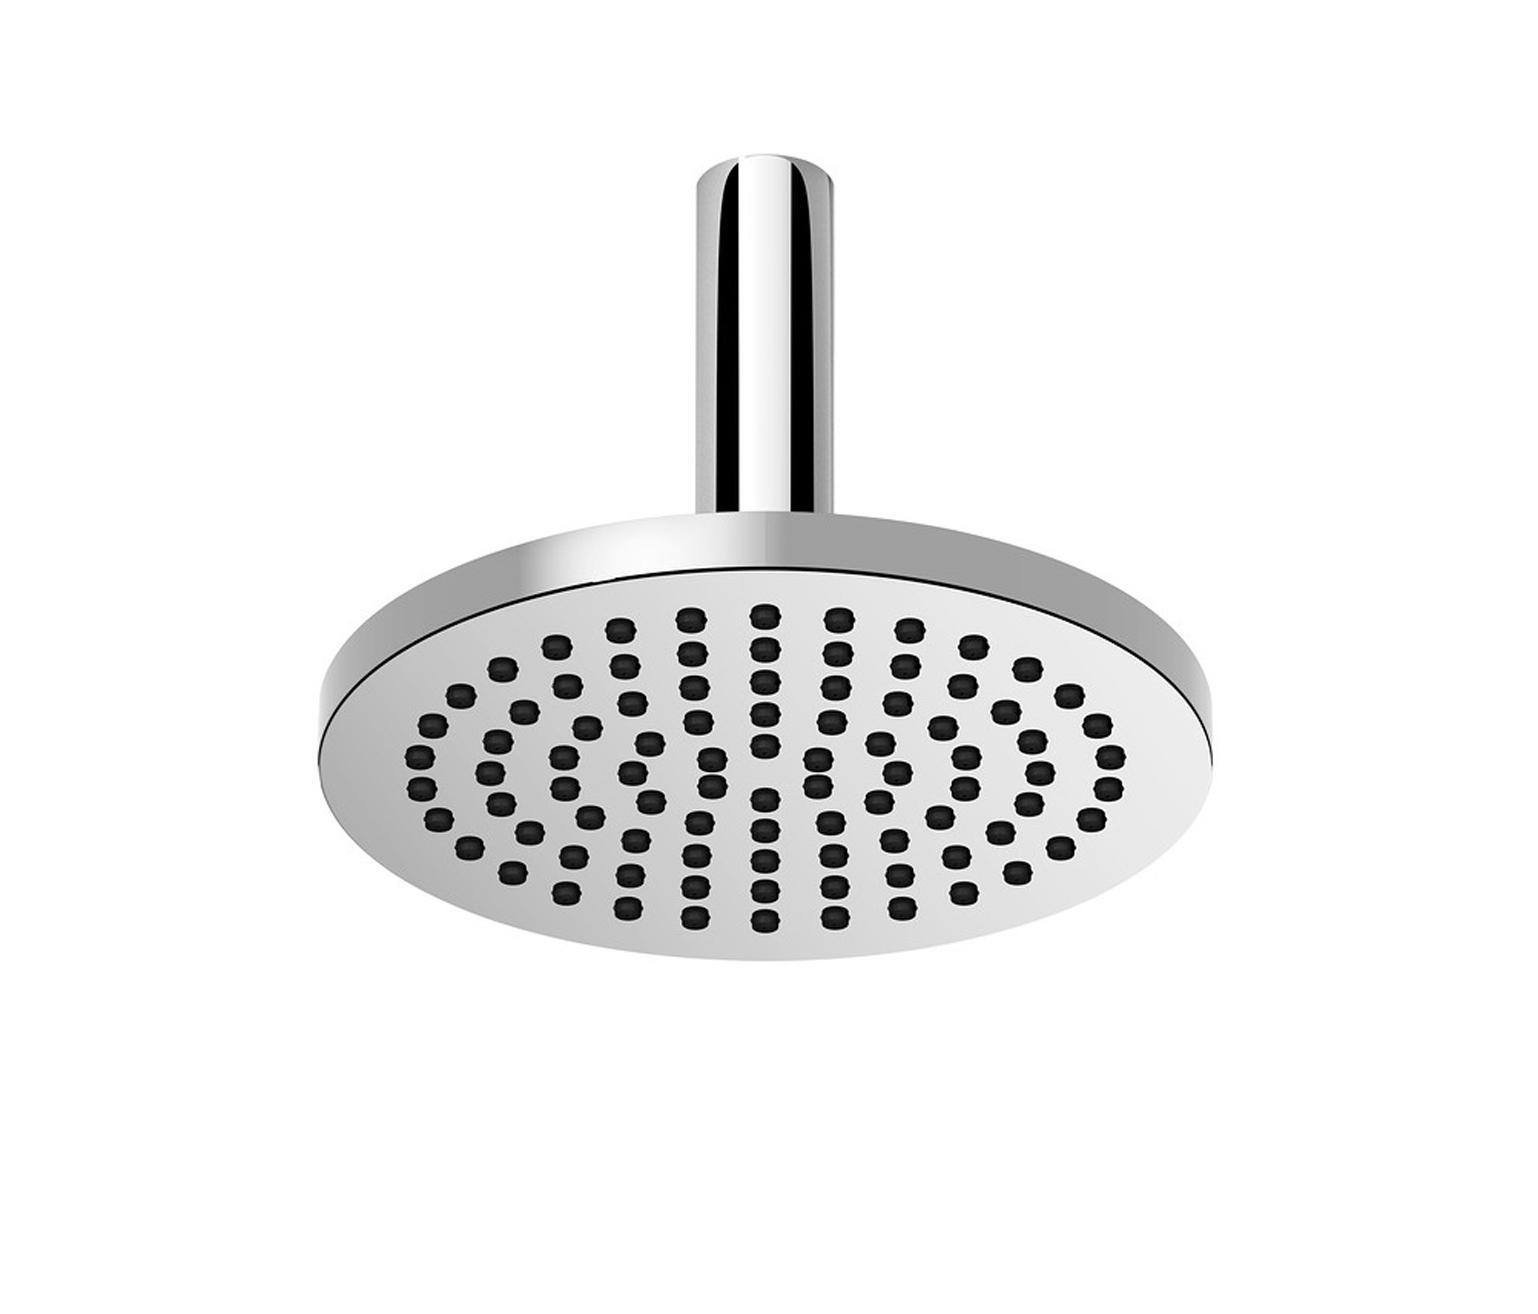 Vaia Rain Shower Shower Taps Mixers From Dornbracht